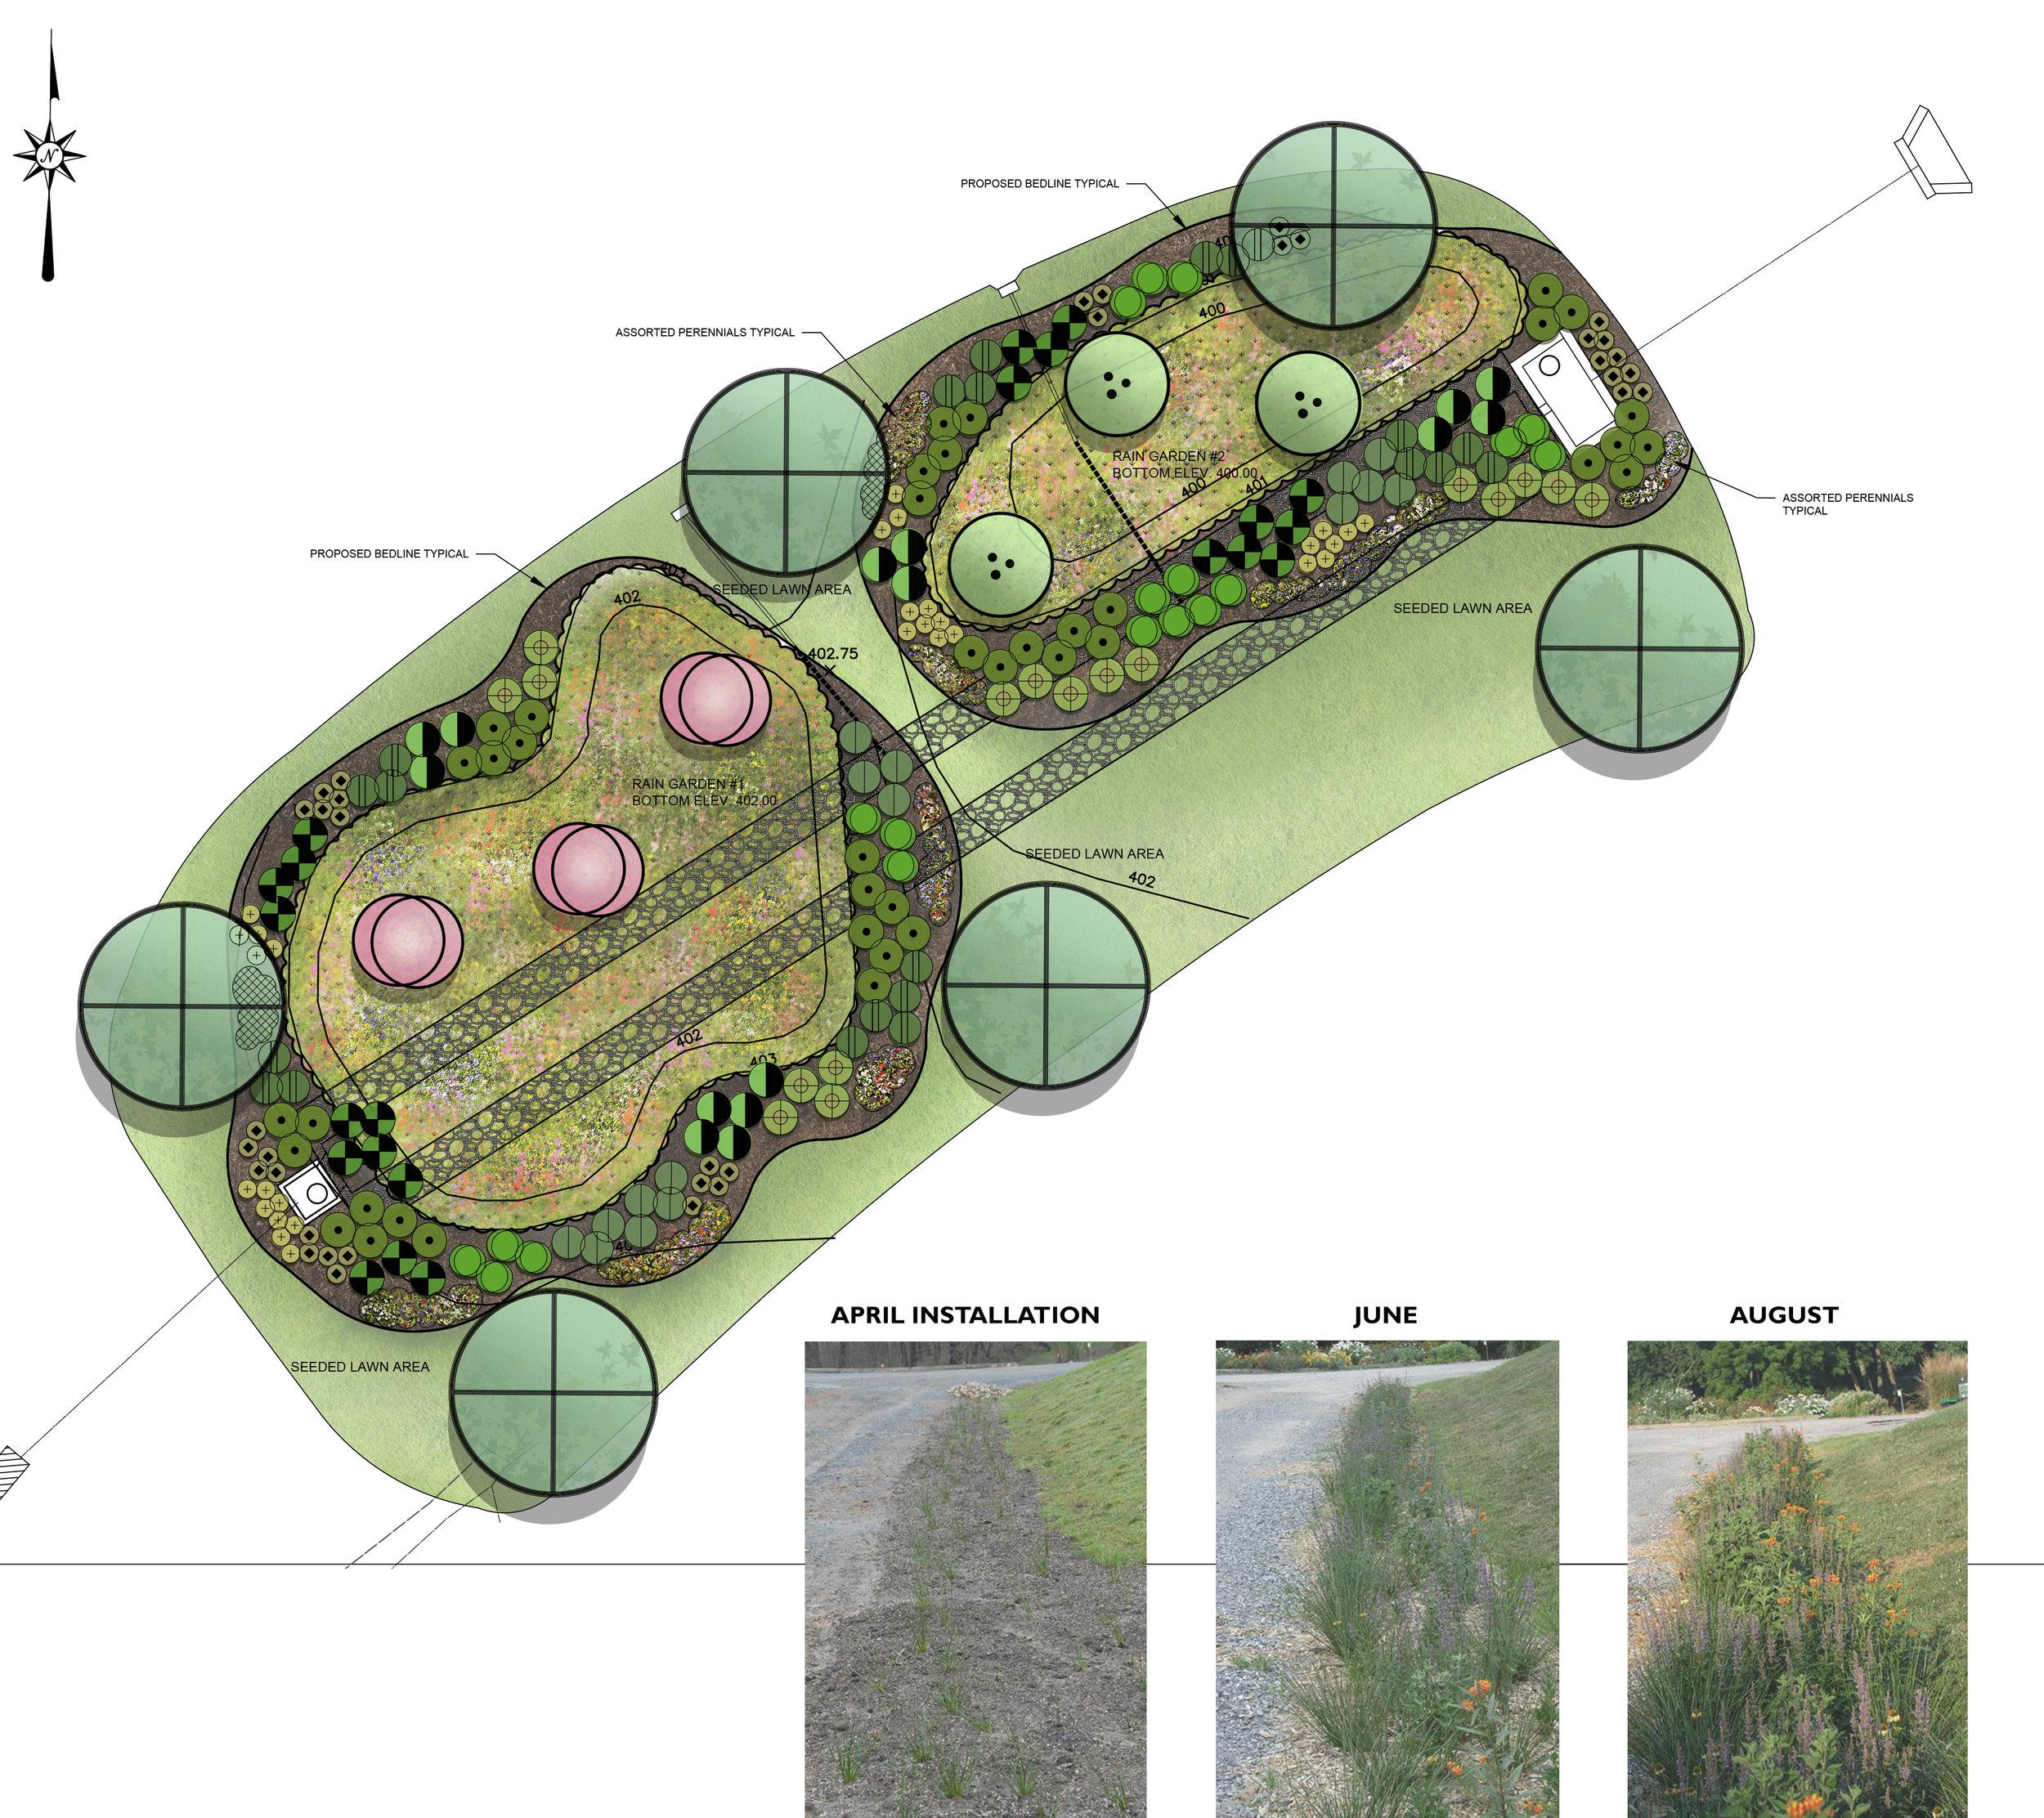 6-24-15_Illustrative_Landscape_Plan_ILP-1.jpg